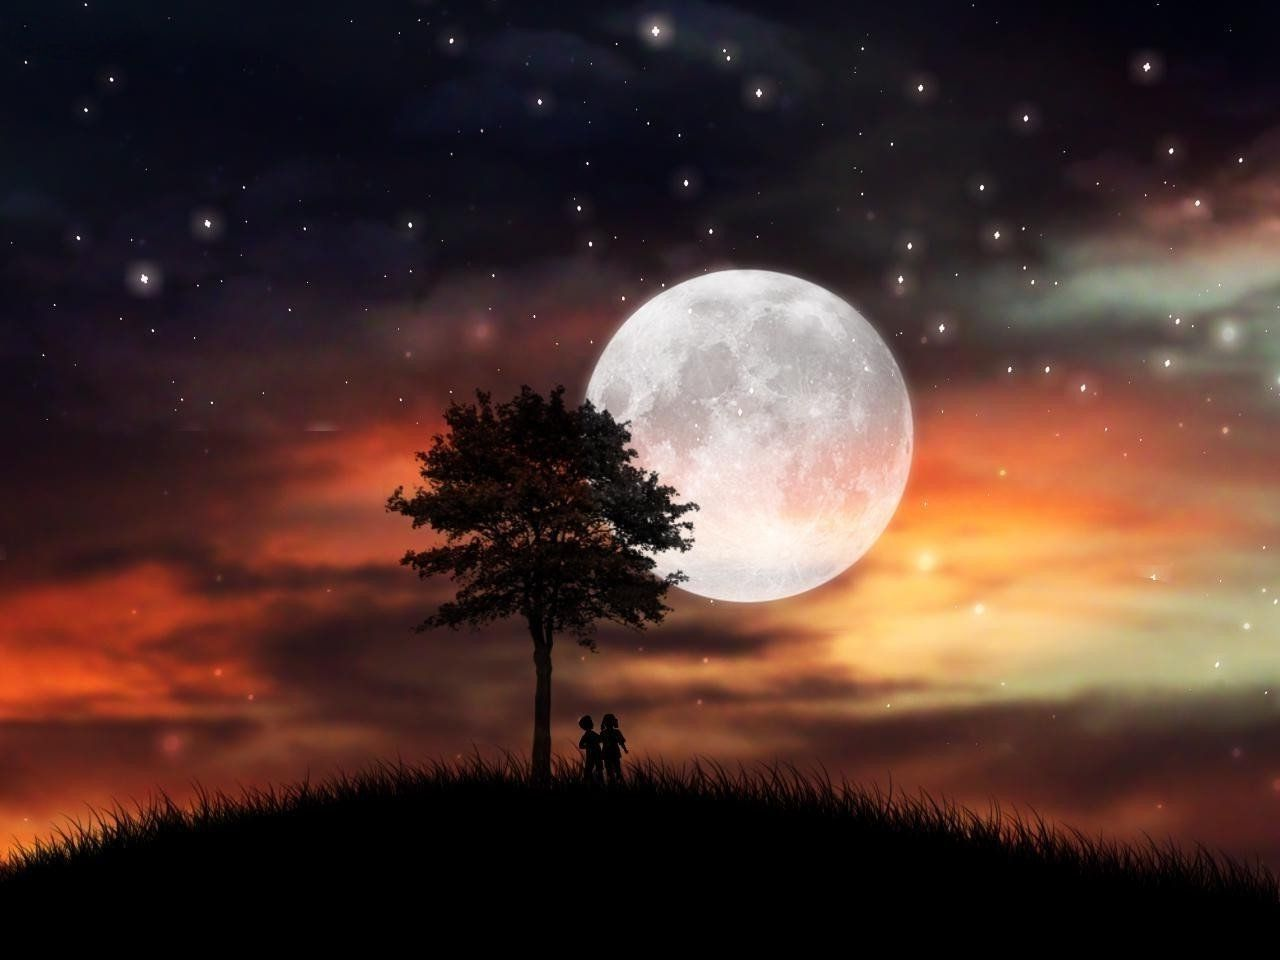 I Ll Take The Moon Night Sky Moon Moon Clouds Night Skies